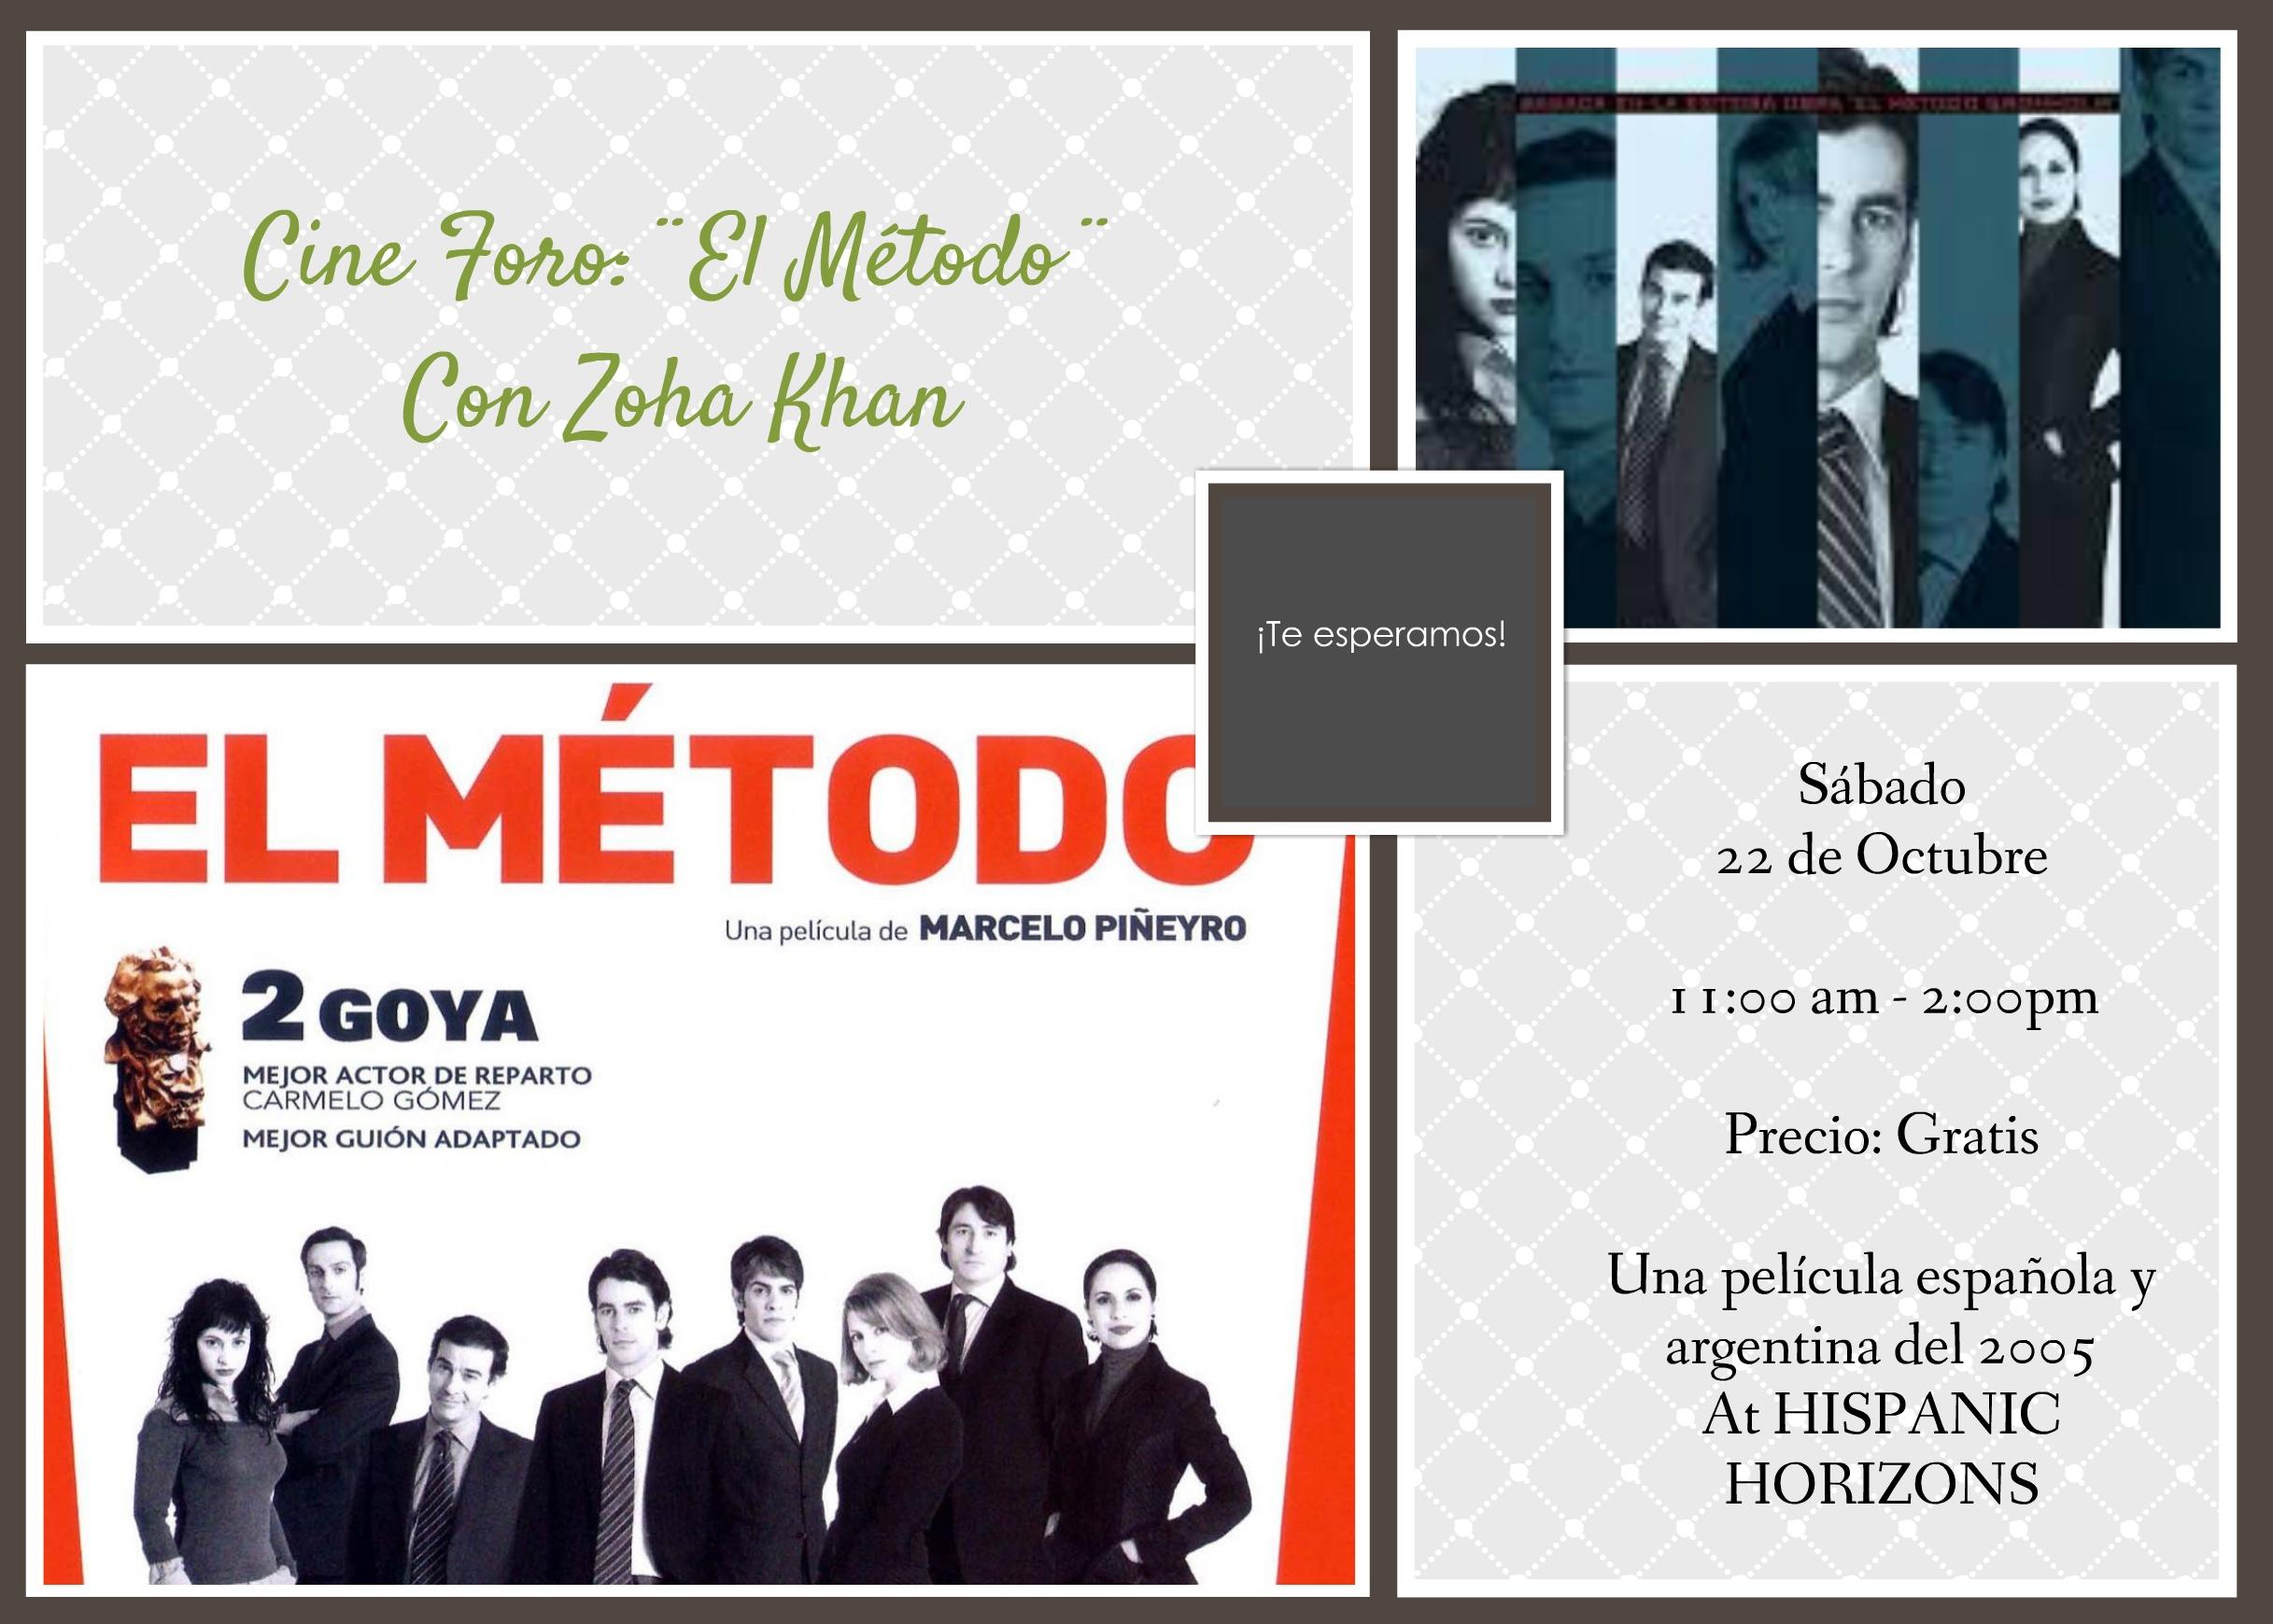 001-invite-1